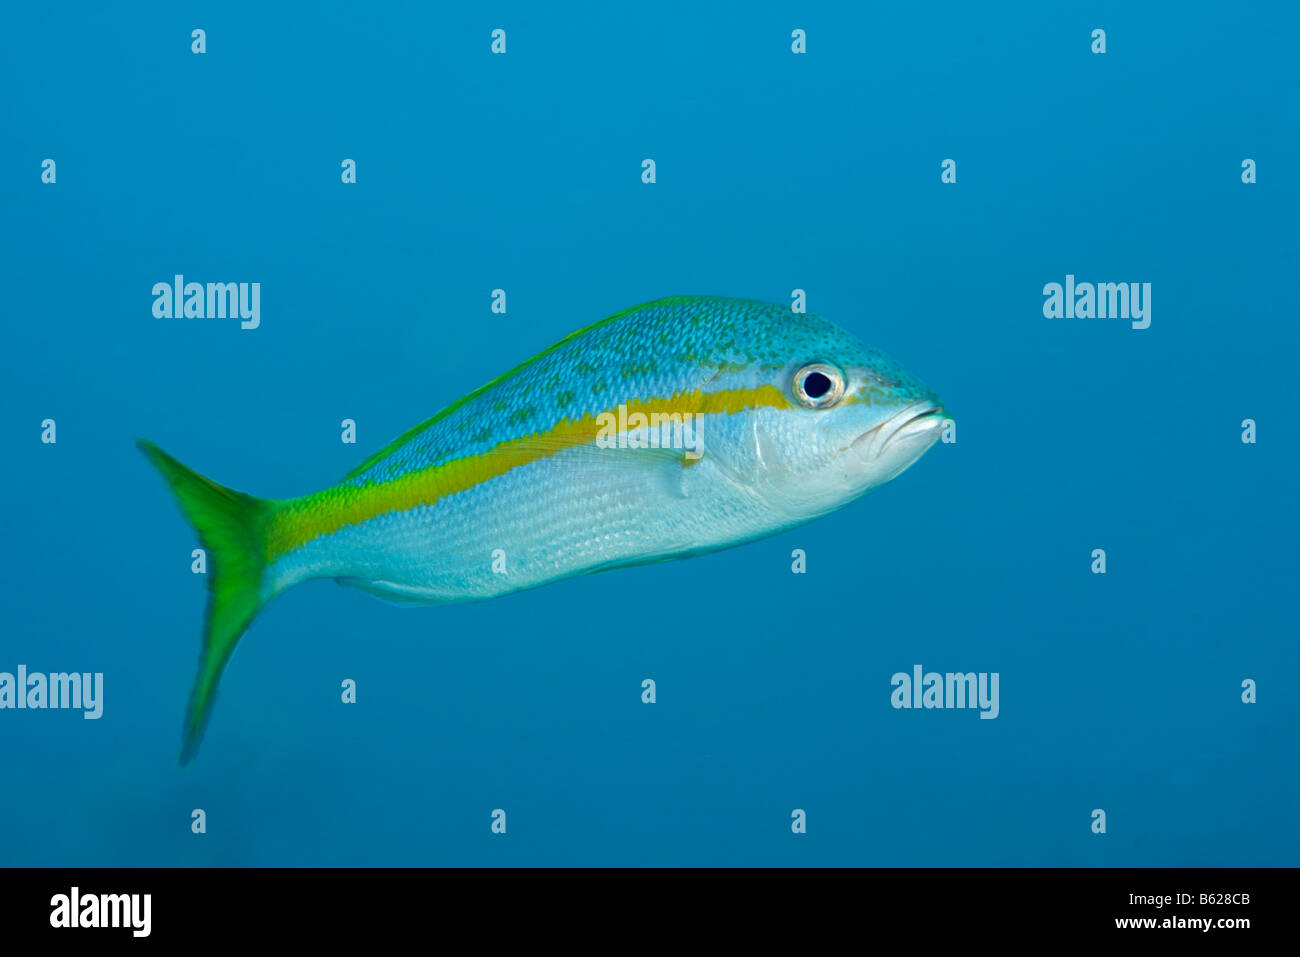 Yellowtail Snapper (Ocyurus Chrysurus) im blauen Wasser, Barrier Reef, San Pedro, Ambergris Cay Insel, Belize, Mittelamerika, Stockbild